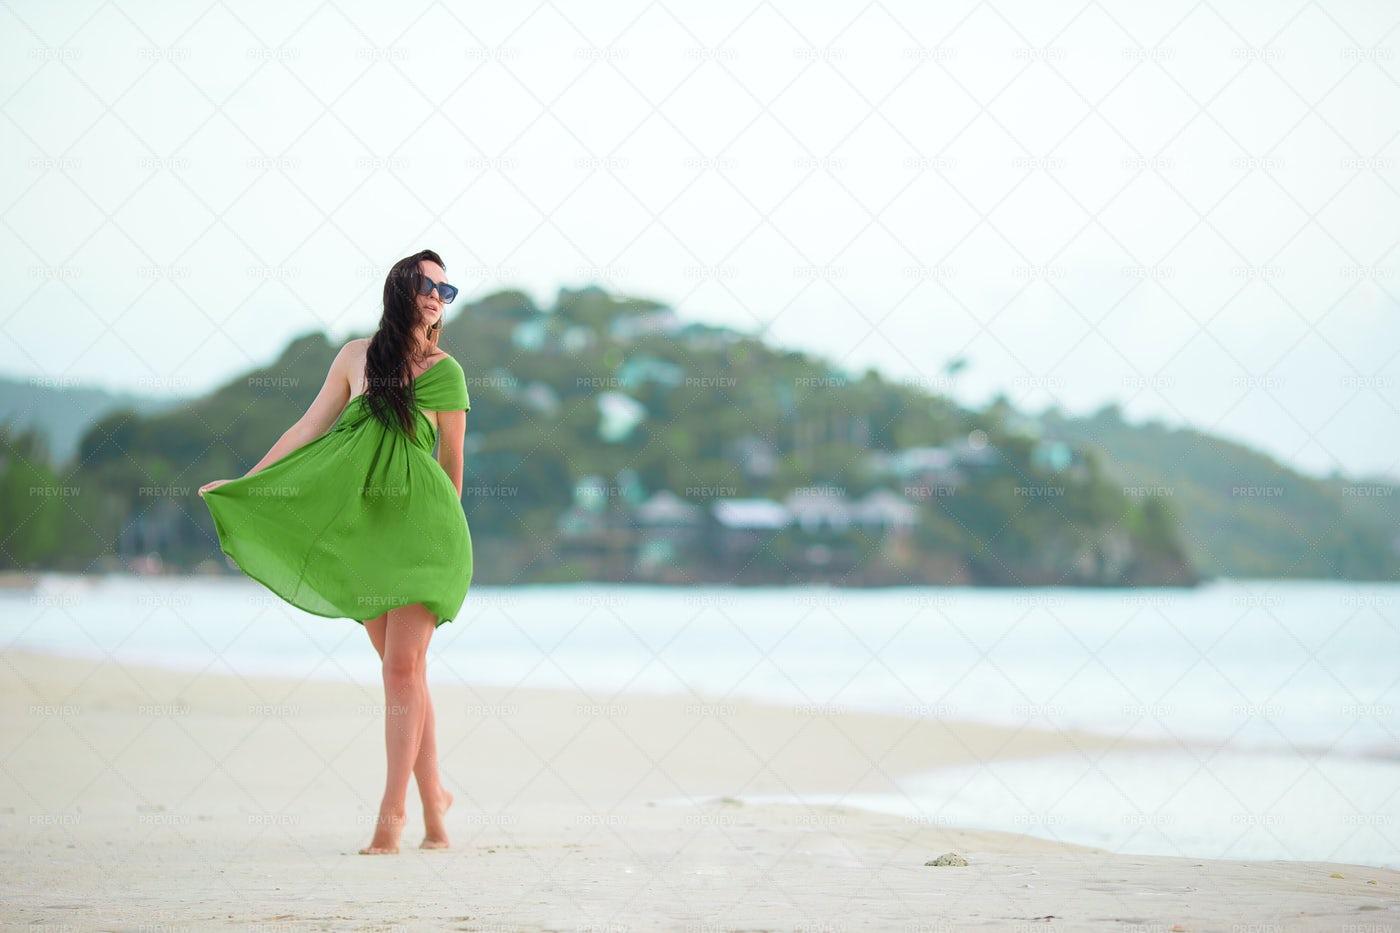 Woman In Green Dress On Beach: Stock Photos